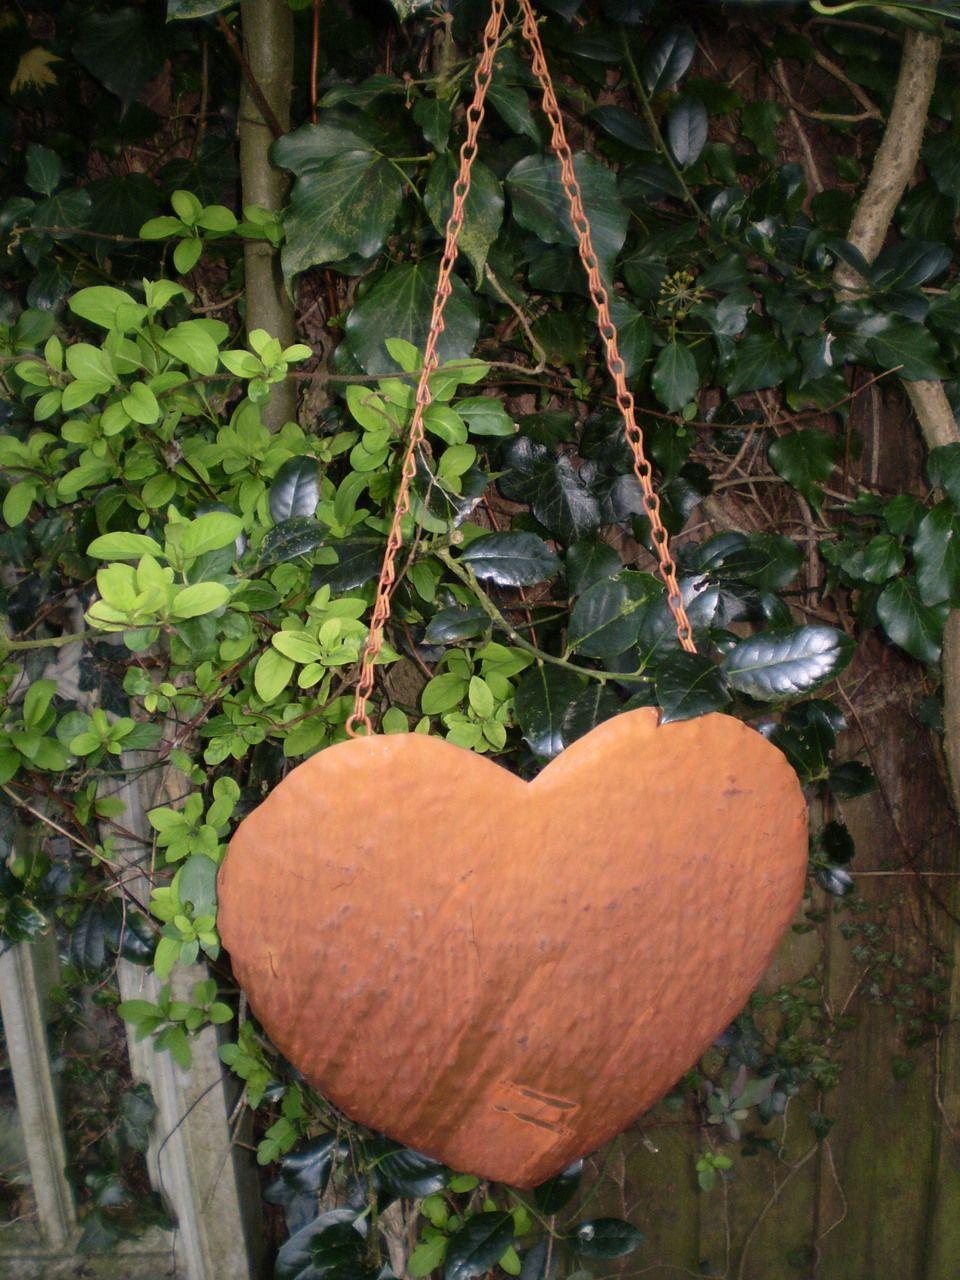 Vintage Romantic Rustic Metal hanging Heart decoration | Gardens ...